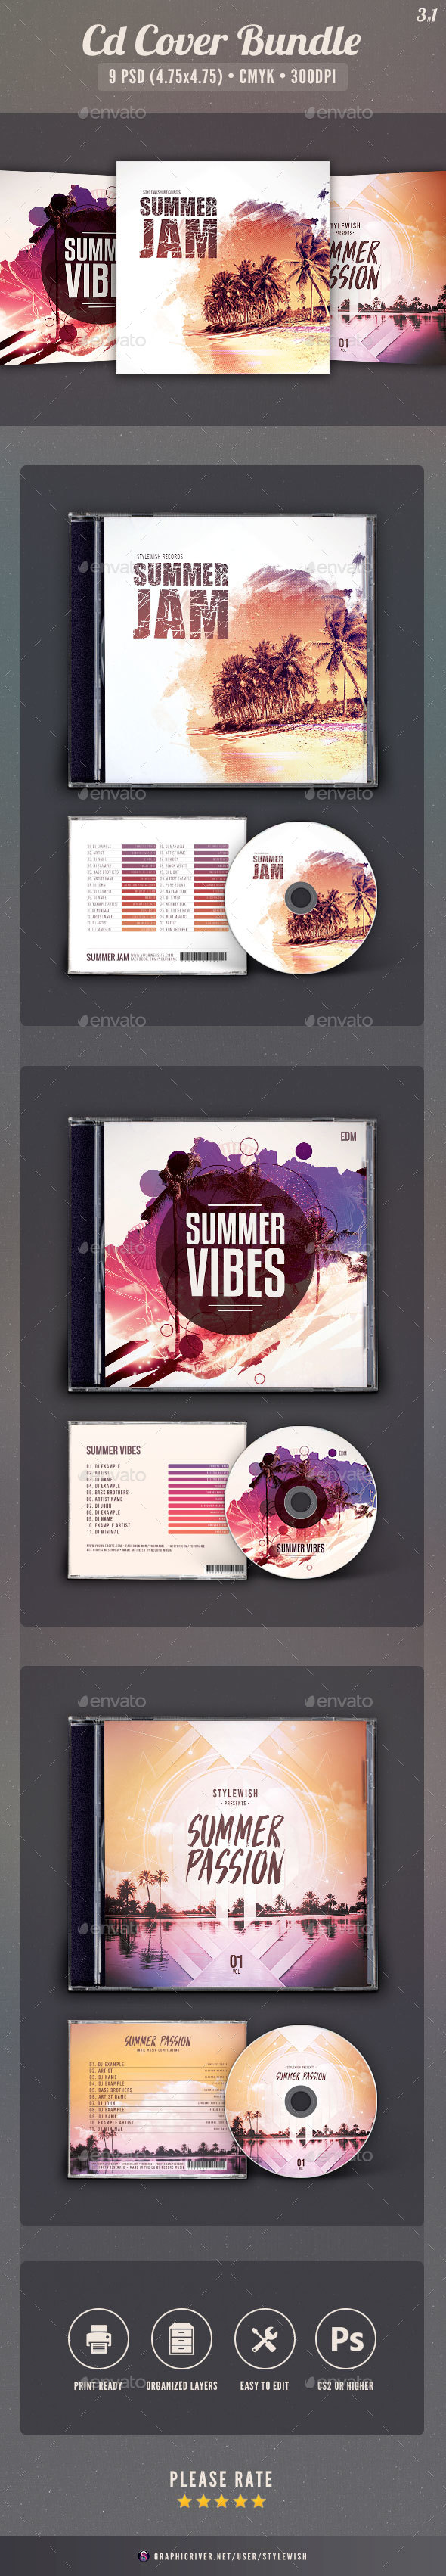 Summer CD Cover Bundle Vol.03 - CD & DVD Artwork Print Templates